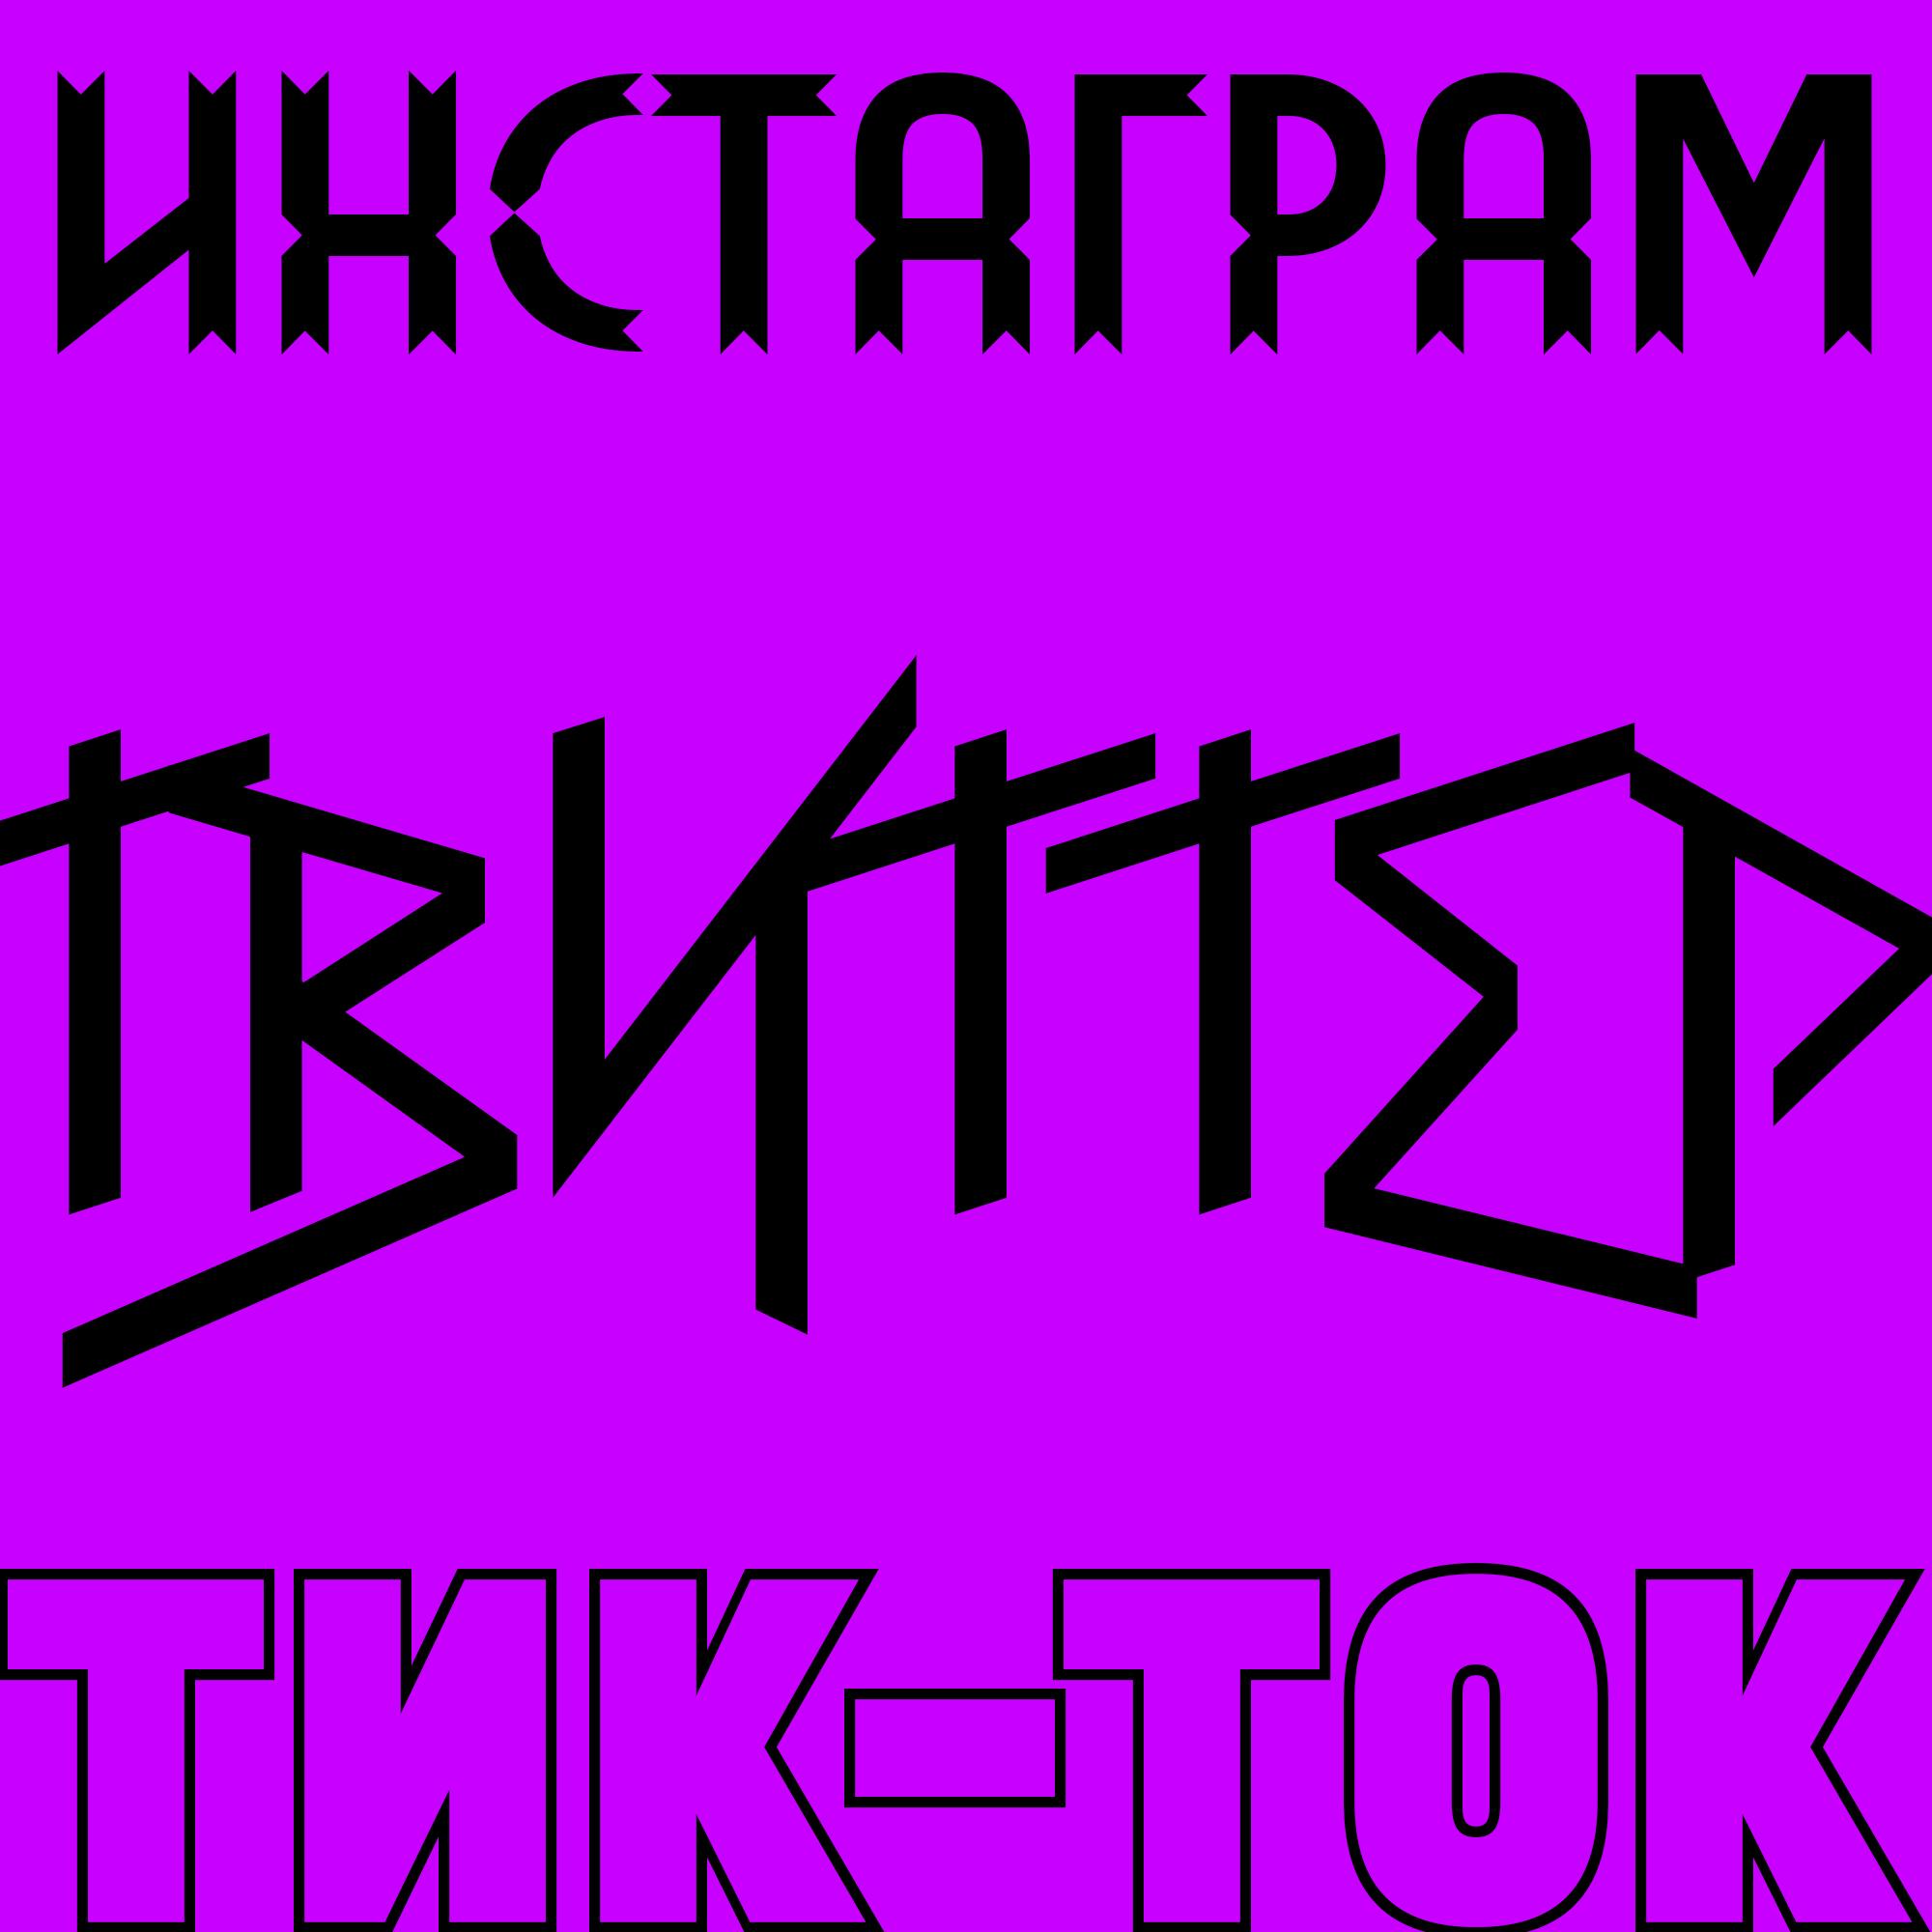 Lurk_11